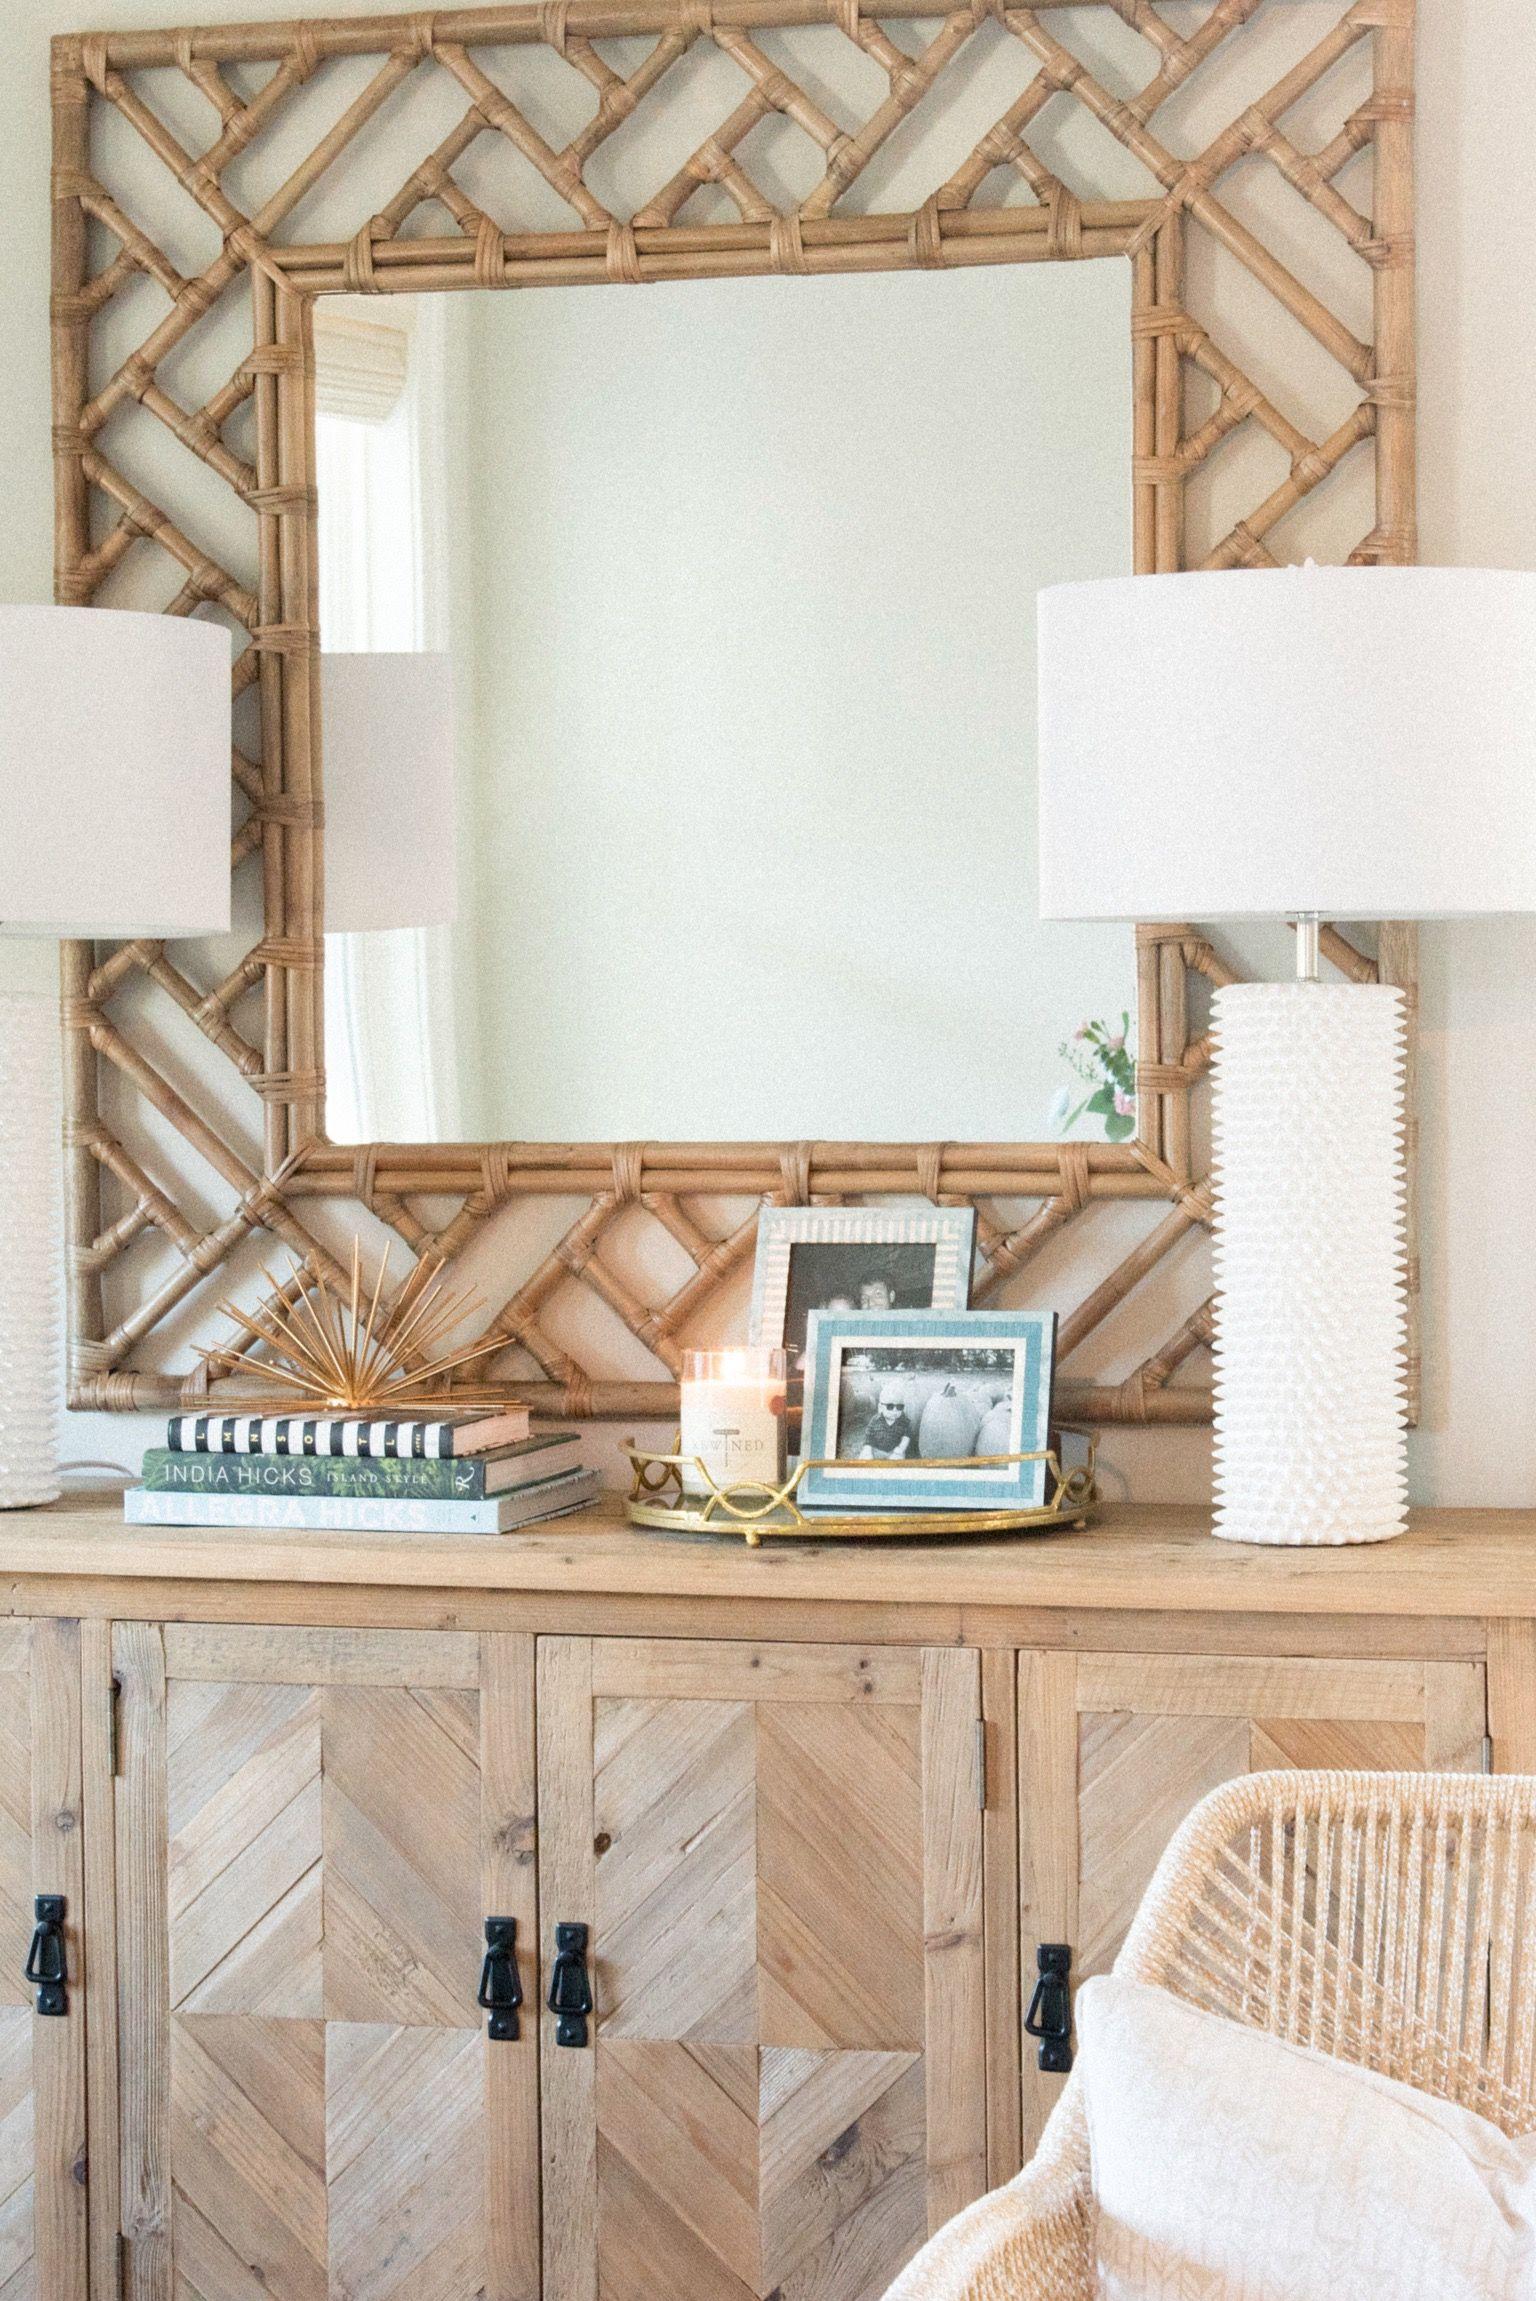 Virtual Design Living Room: #designsbymeganmac #brightboho #whitetablelamps